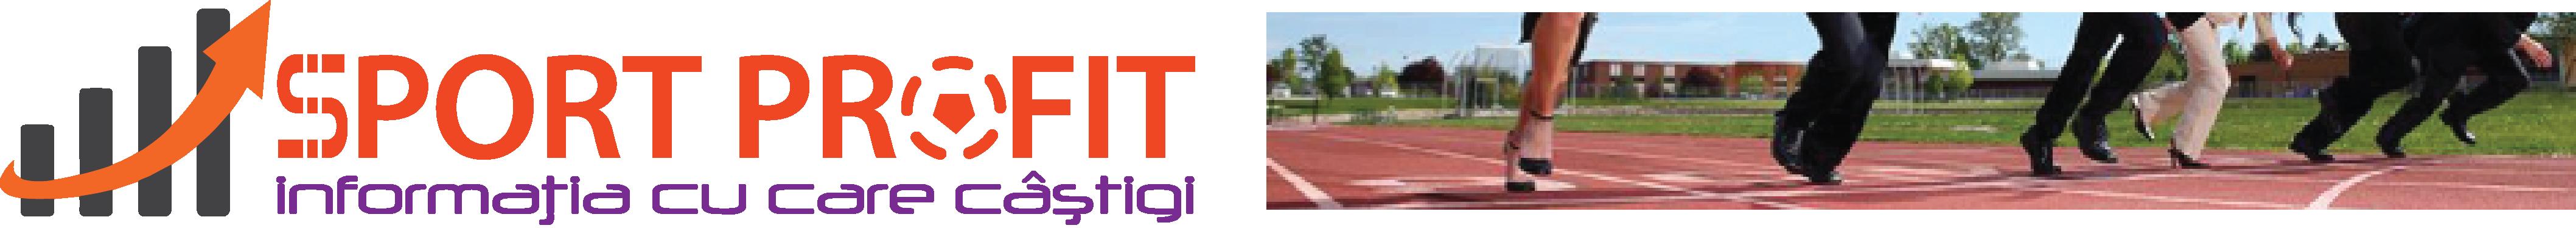 sportprofit.ro